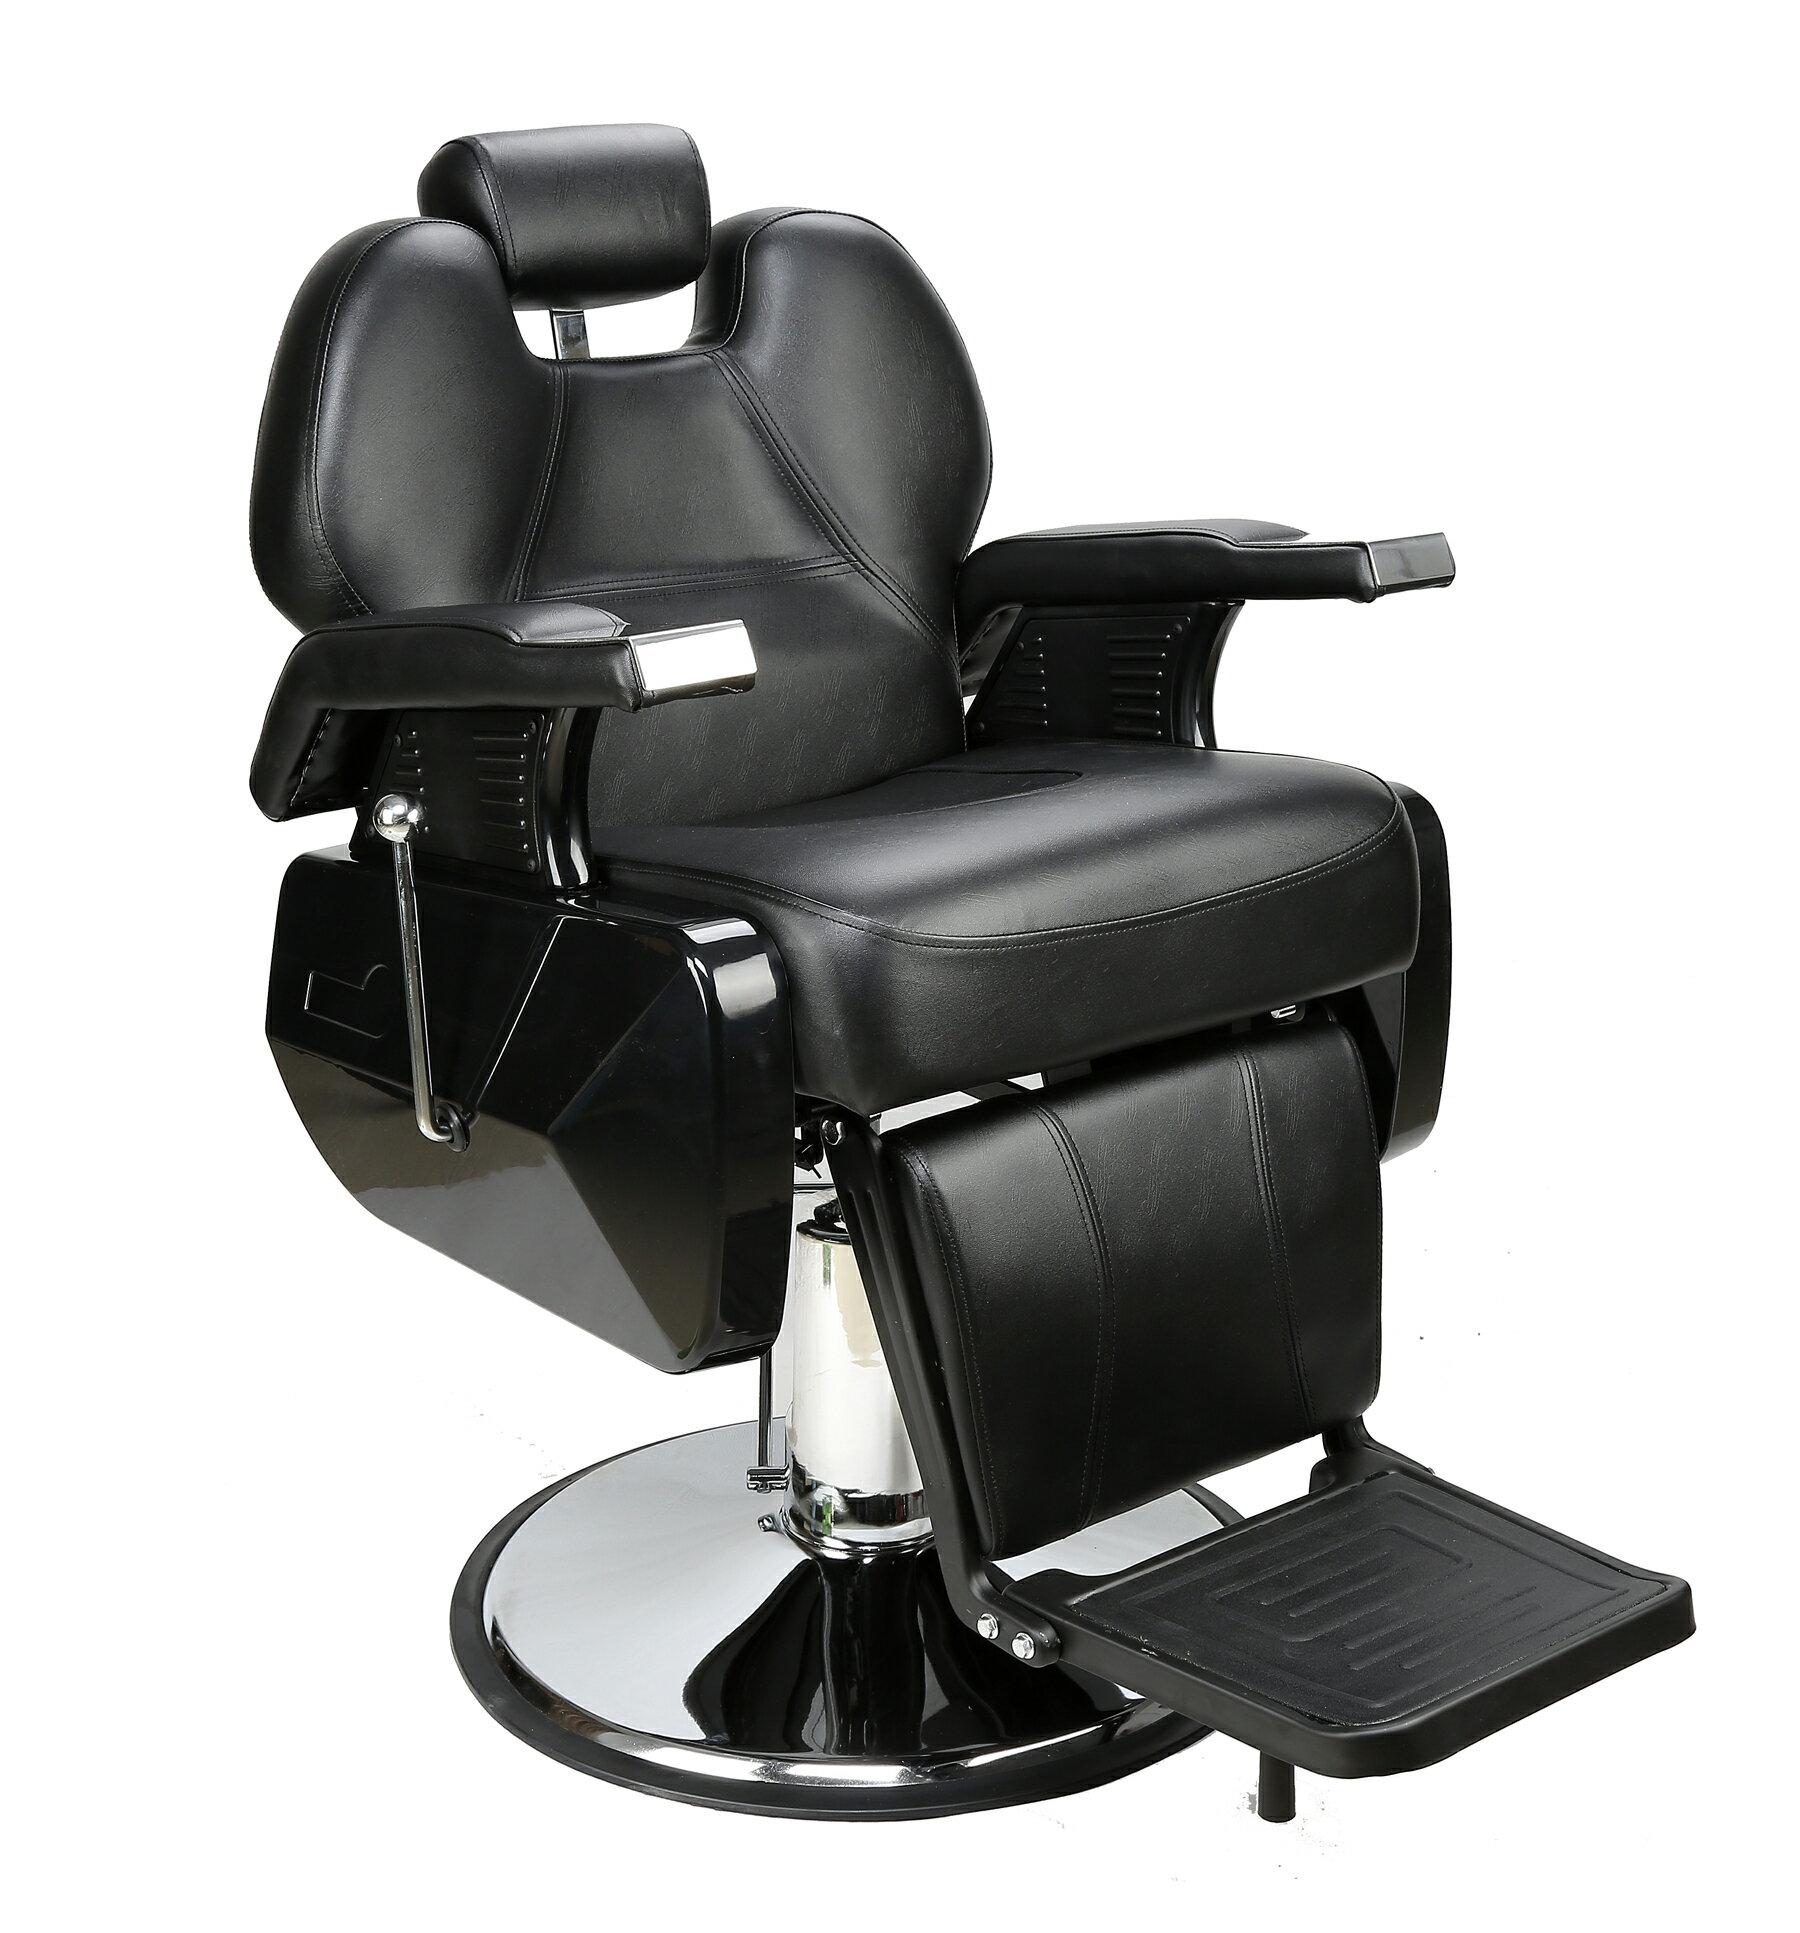 BarberPub All Purpose Hydraulic Recline Salon Beauty Spa Styling Barber Chair Black 0